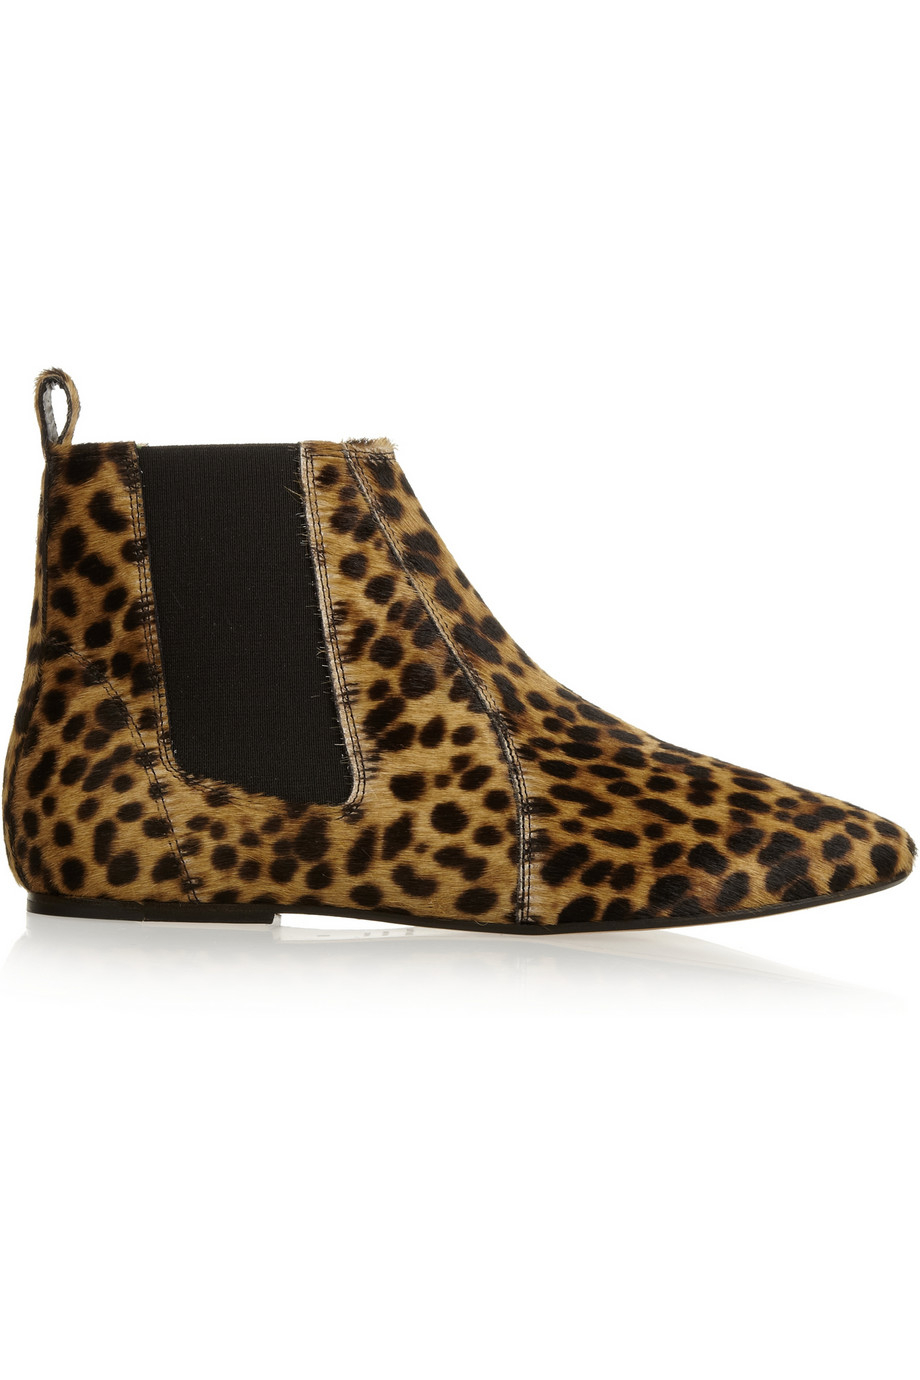 Isabel Marant 201 Toile Dewar Leopardprint Calf Hair Ankle